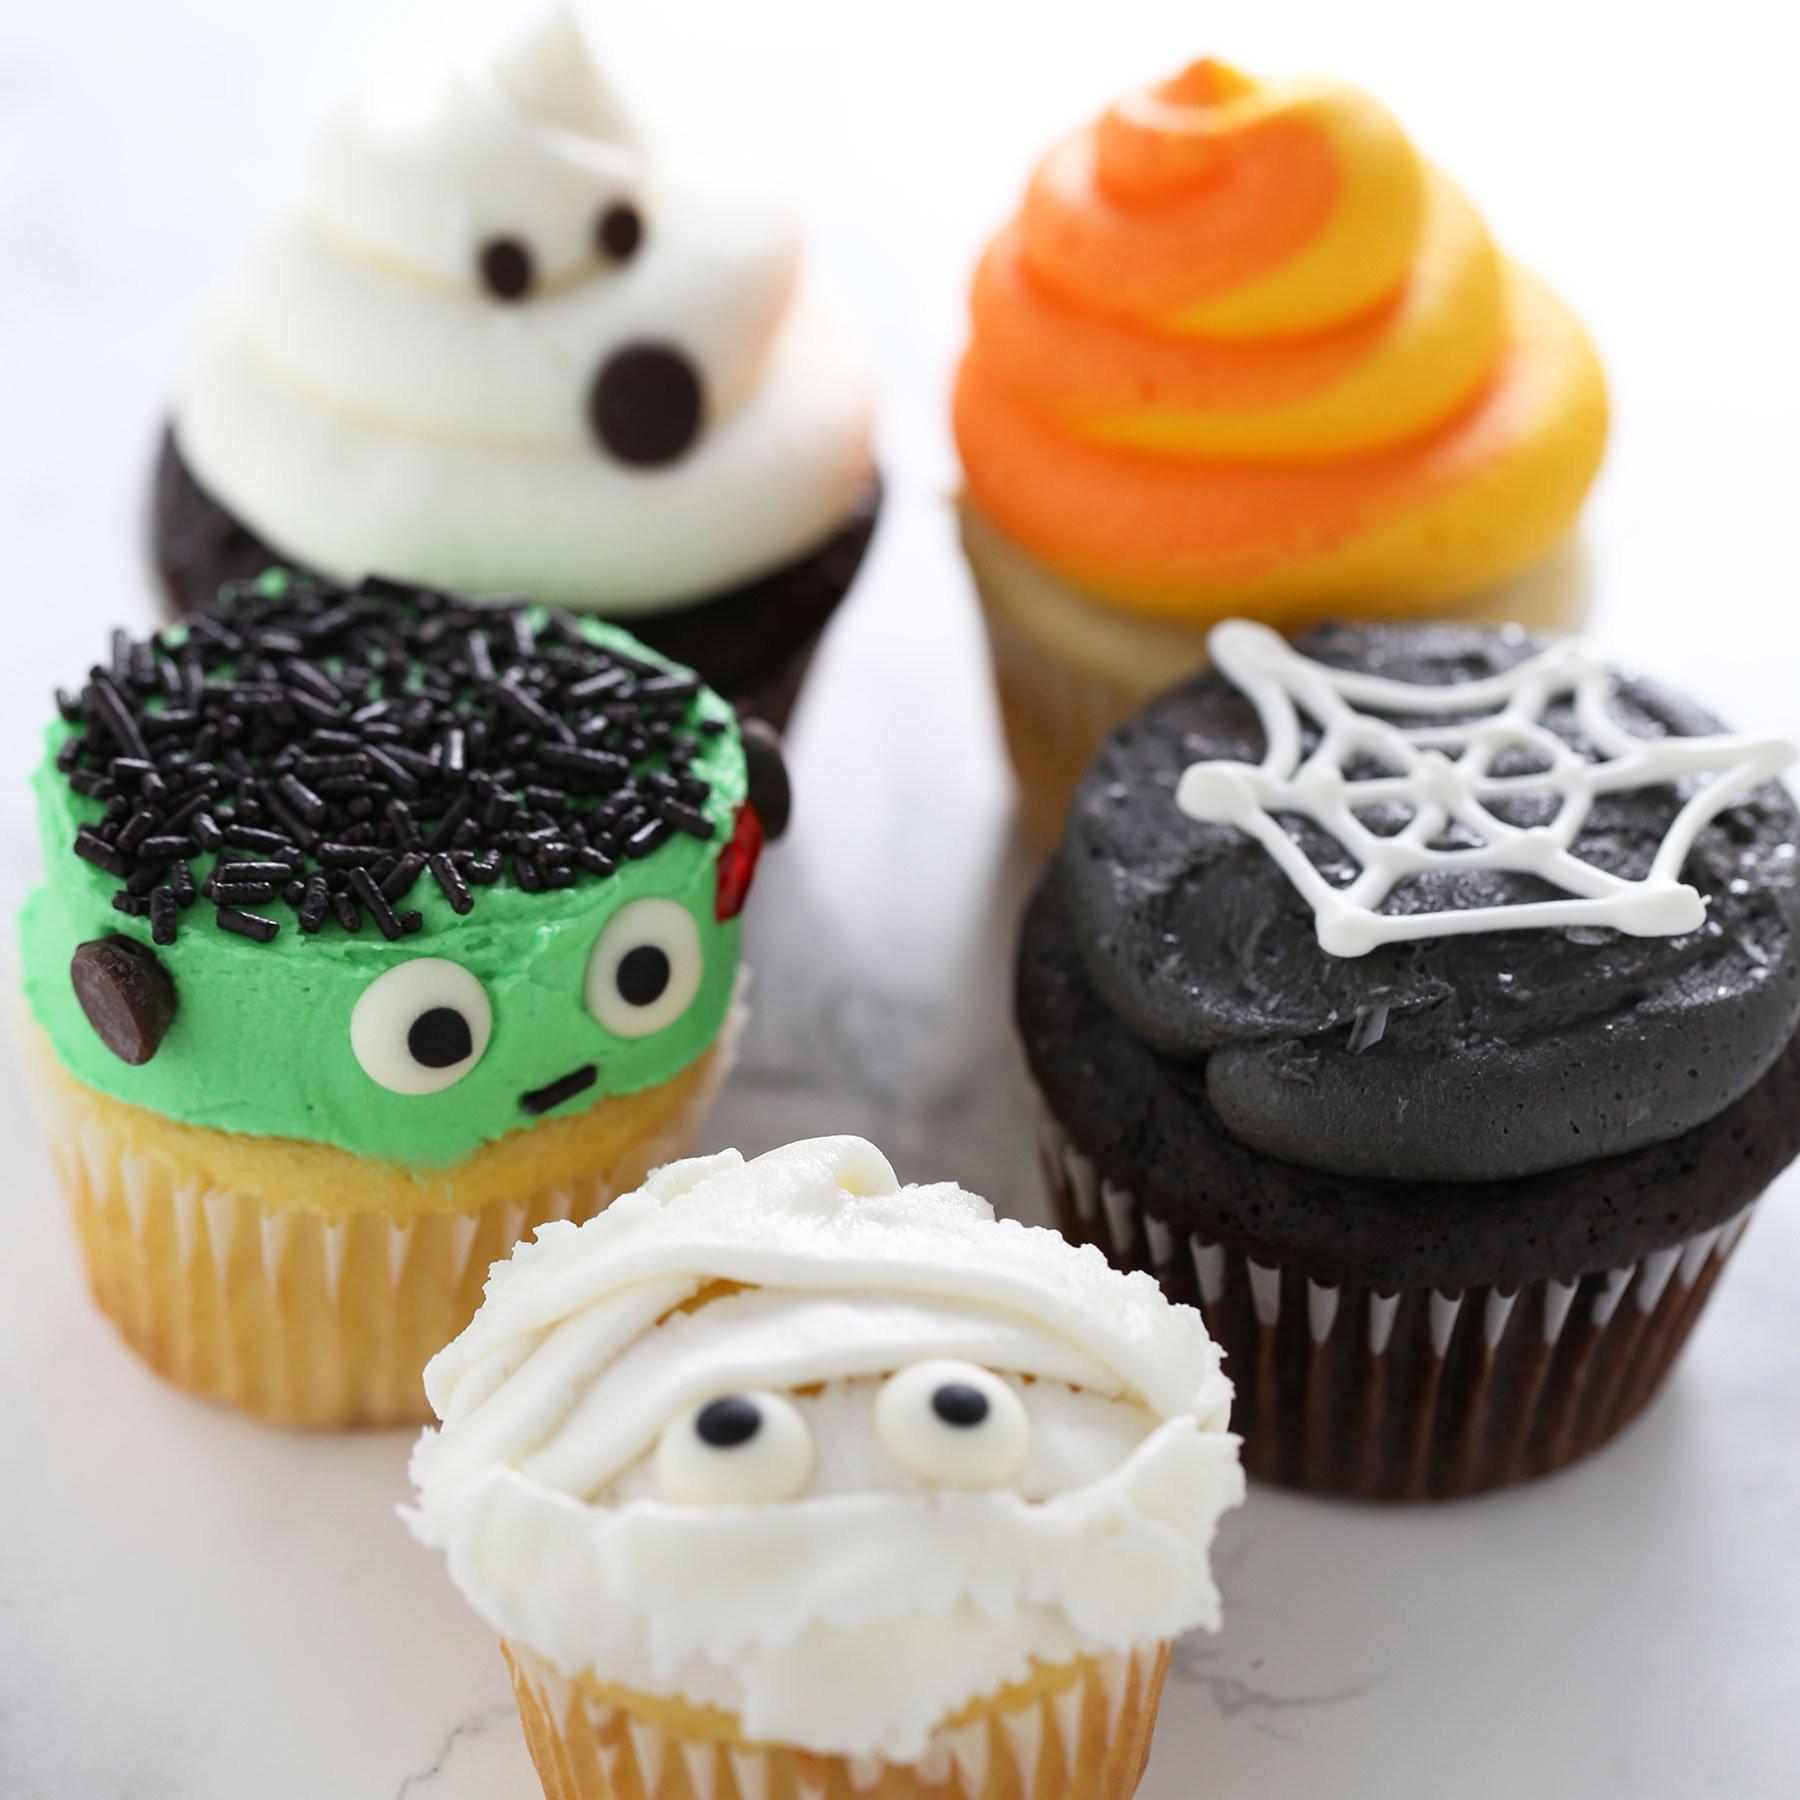 Halloween Cupcake Cakes  How to Make Halloween Cupcakes Handle the Heat